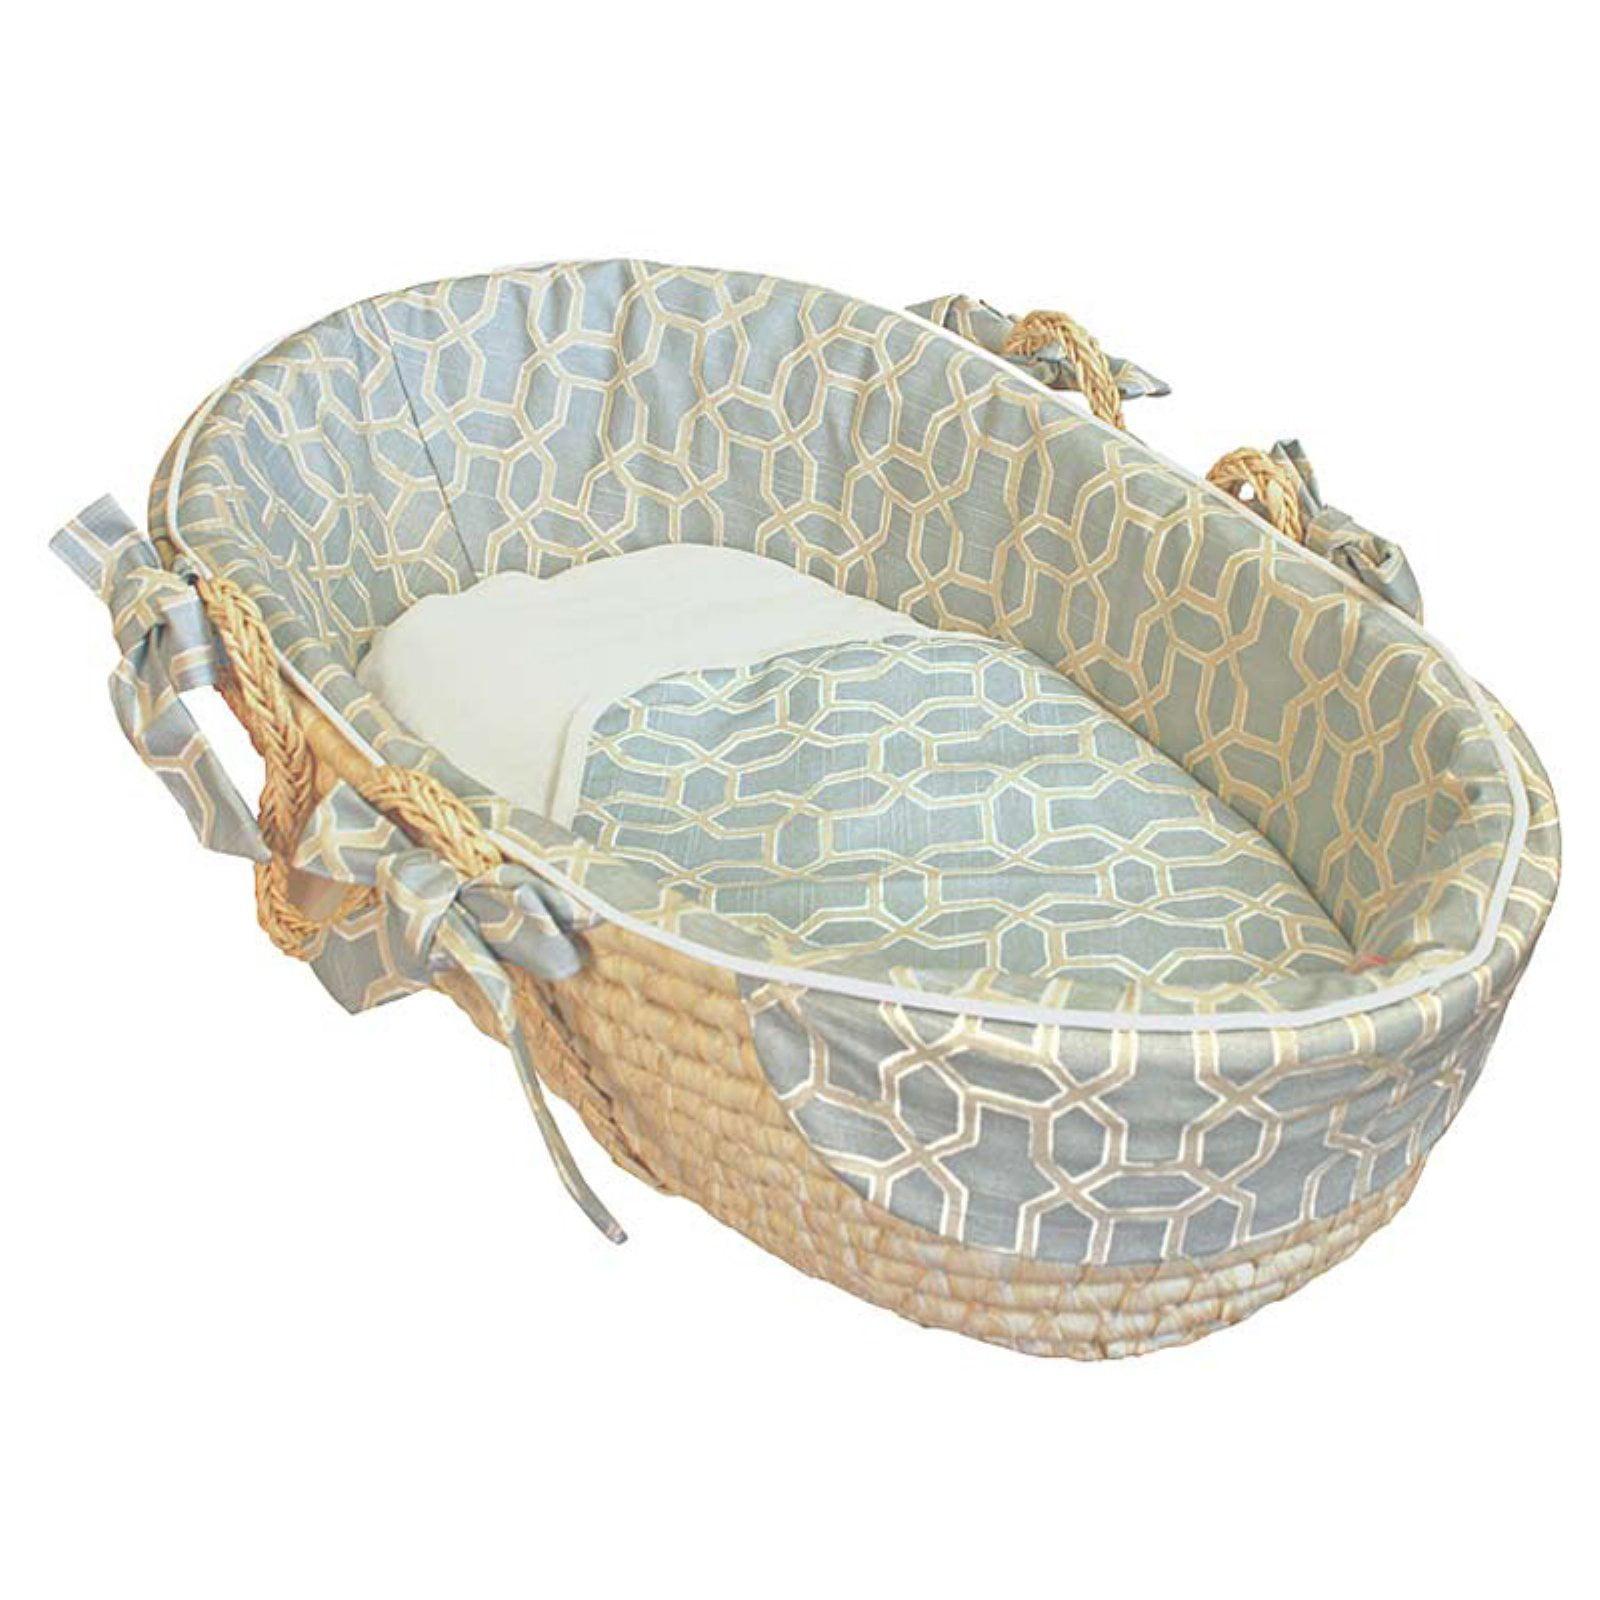 Hoohobbers Pebbles Sky Blue Moses Basket - Tailored